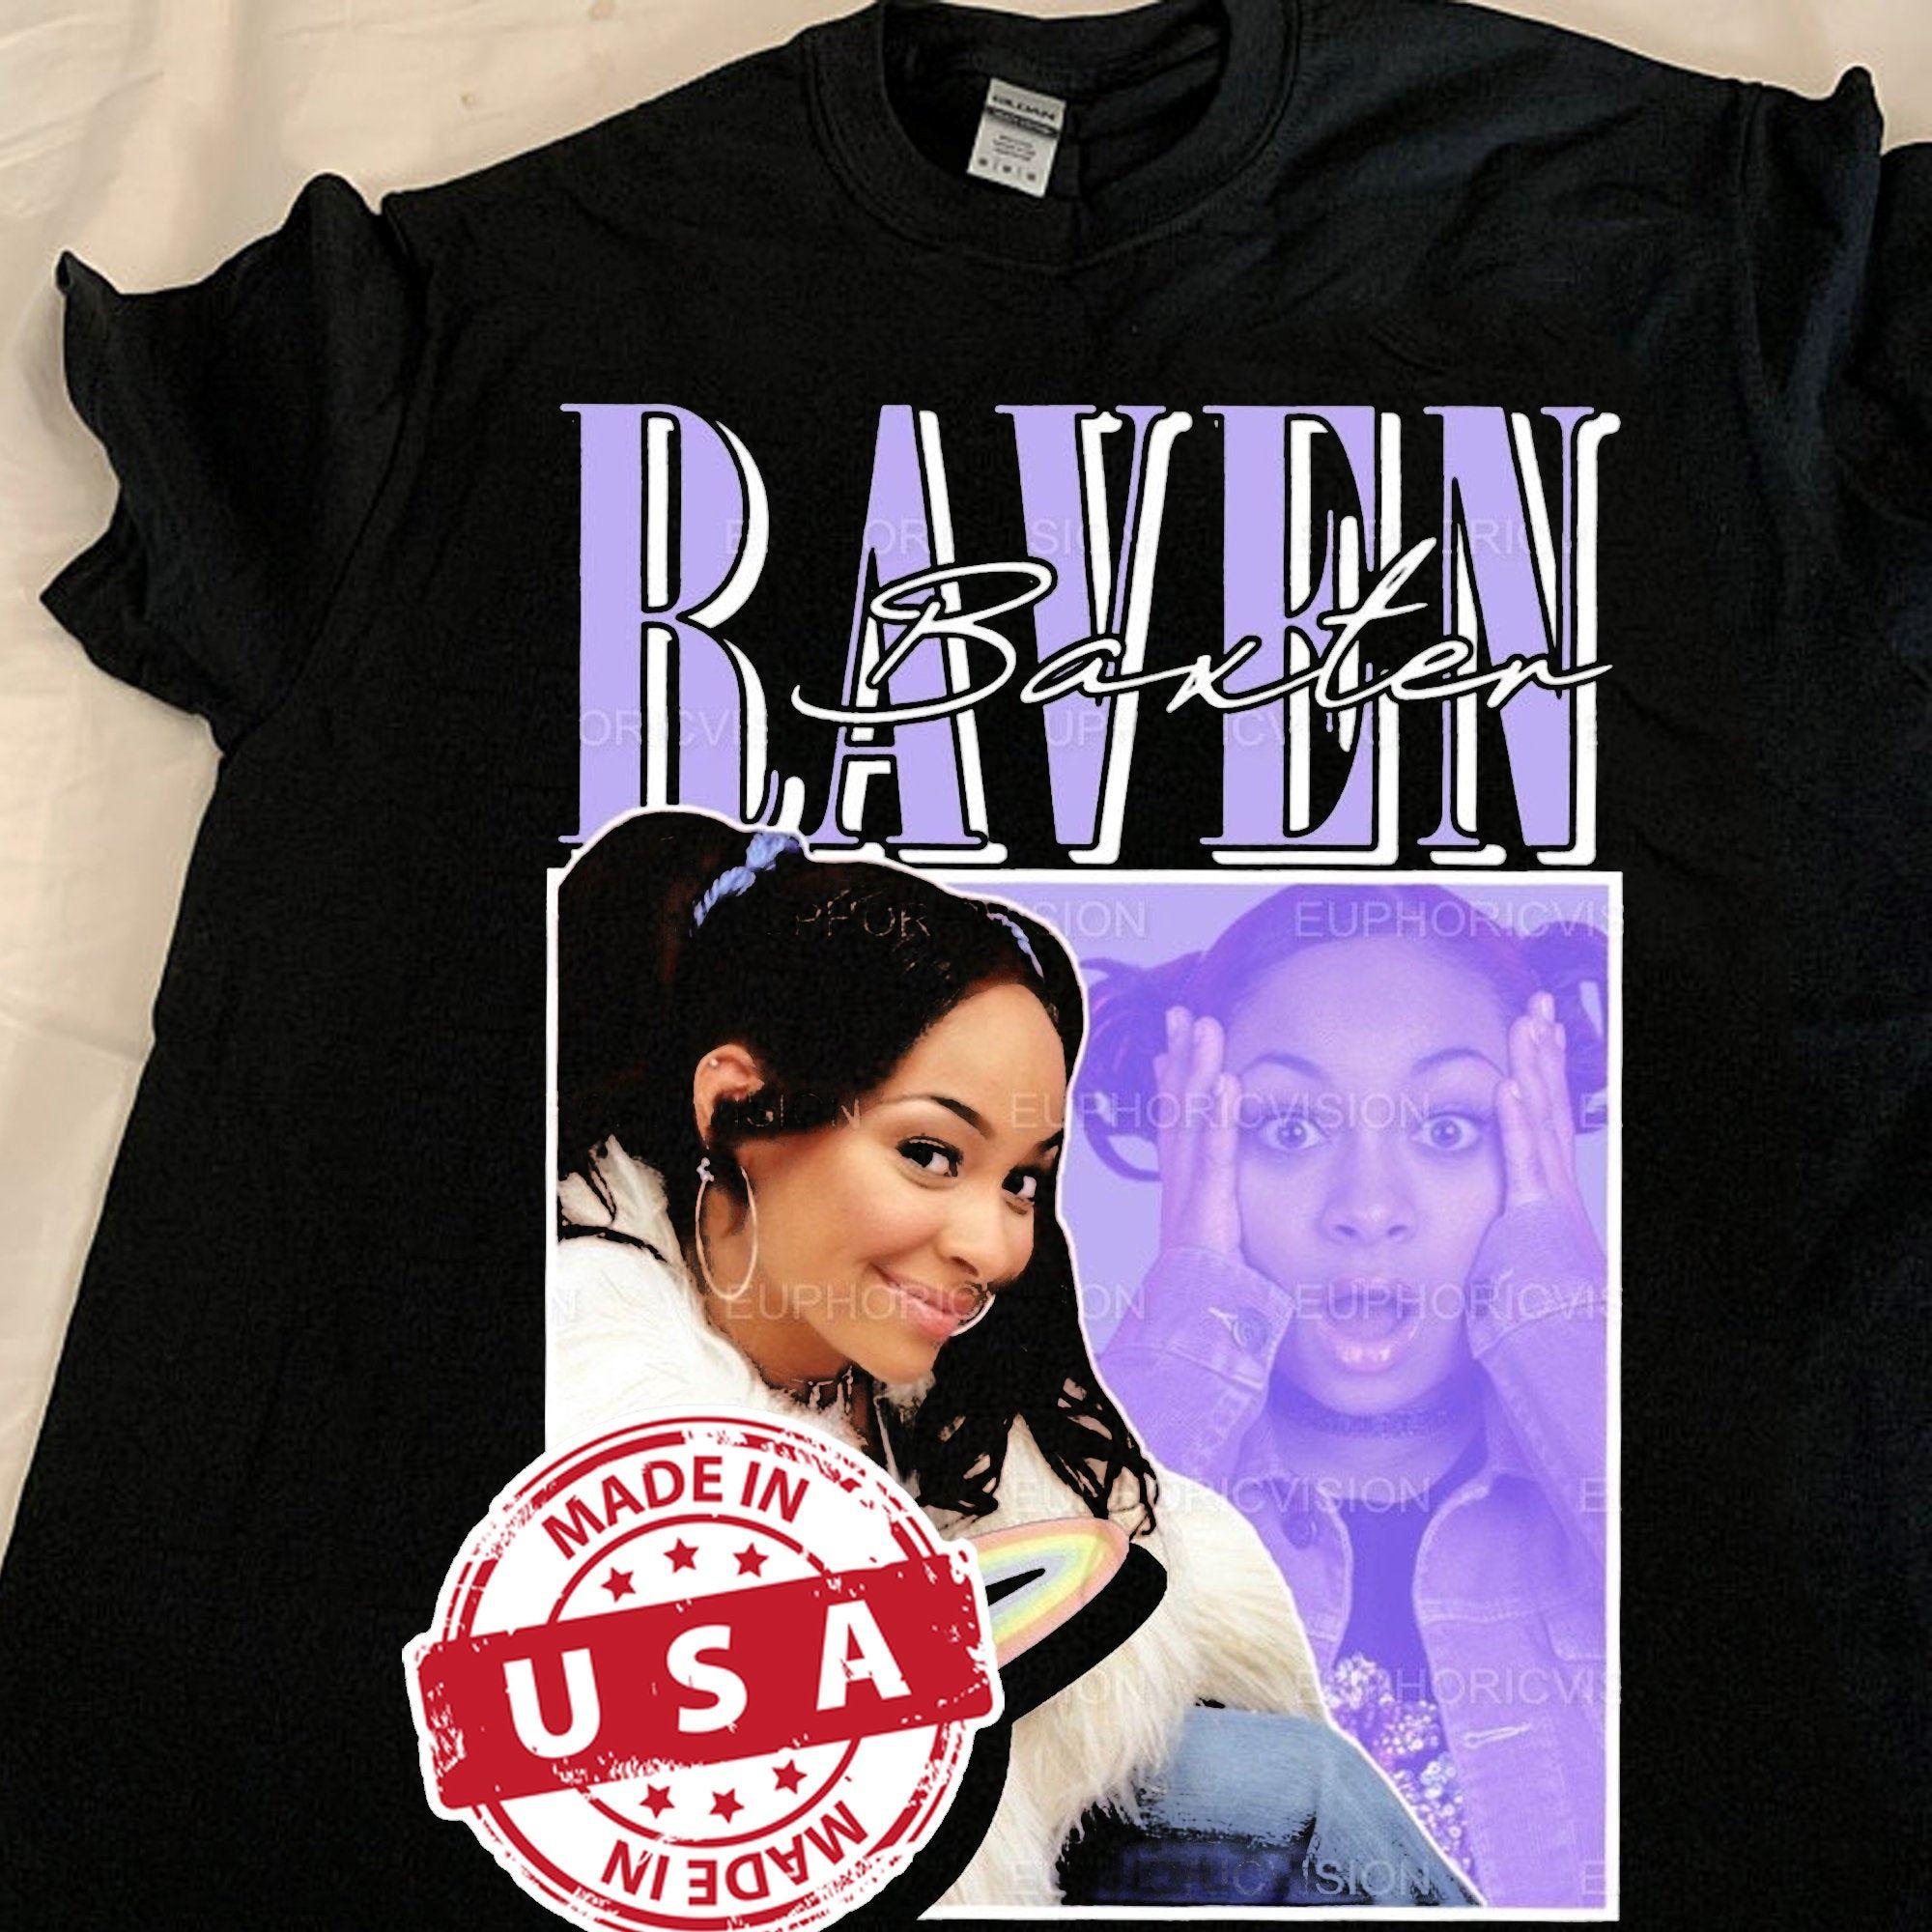 Raven Baxter 90s Vintage Tee 90s Vintage Tee Gift For Men Women Unisex Unisex T-shirt